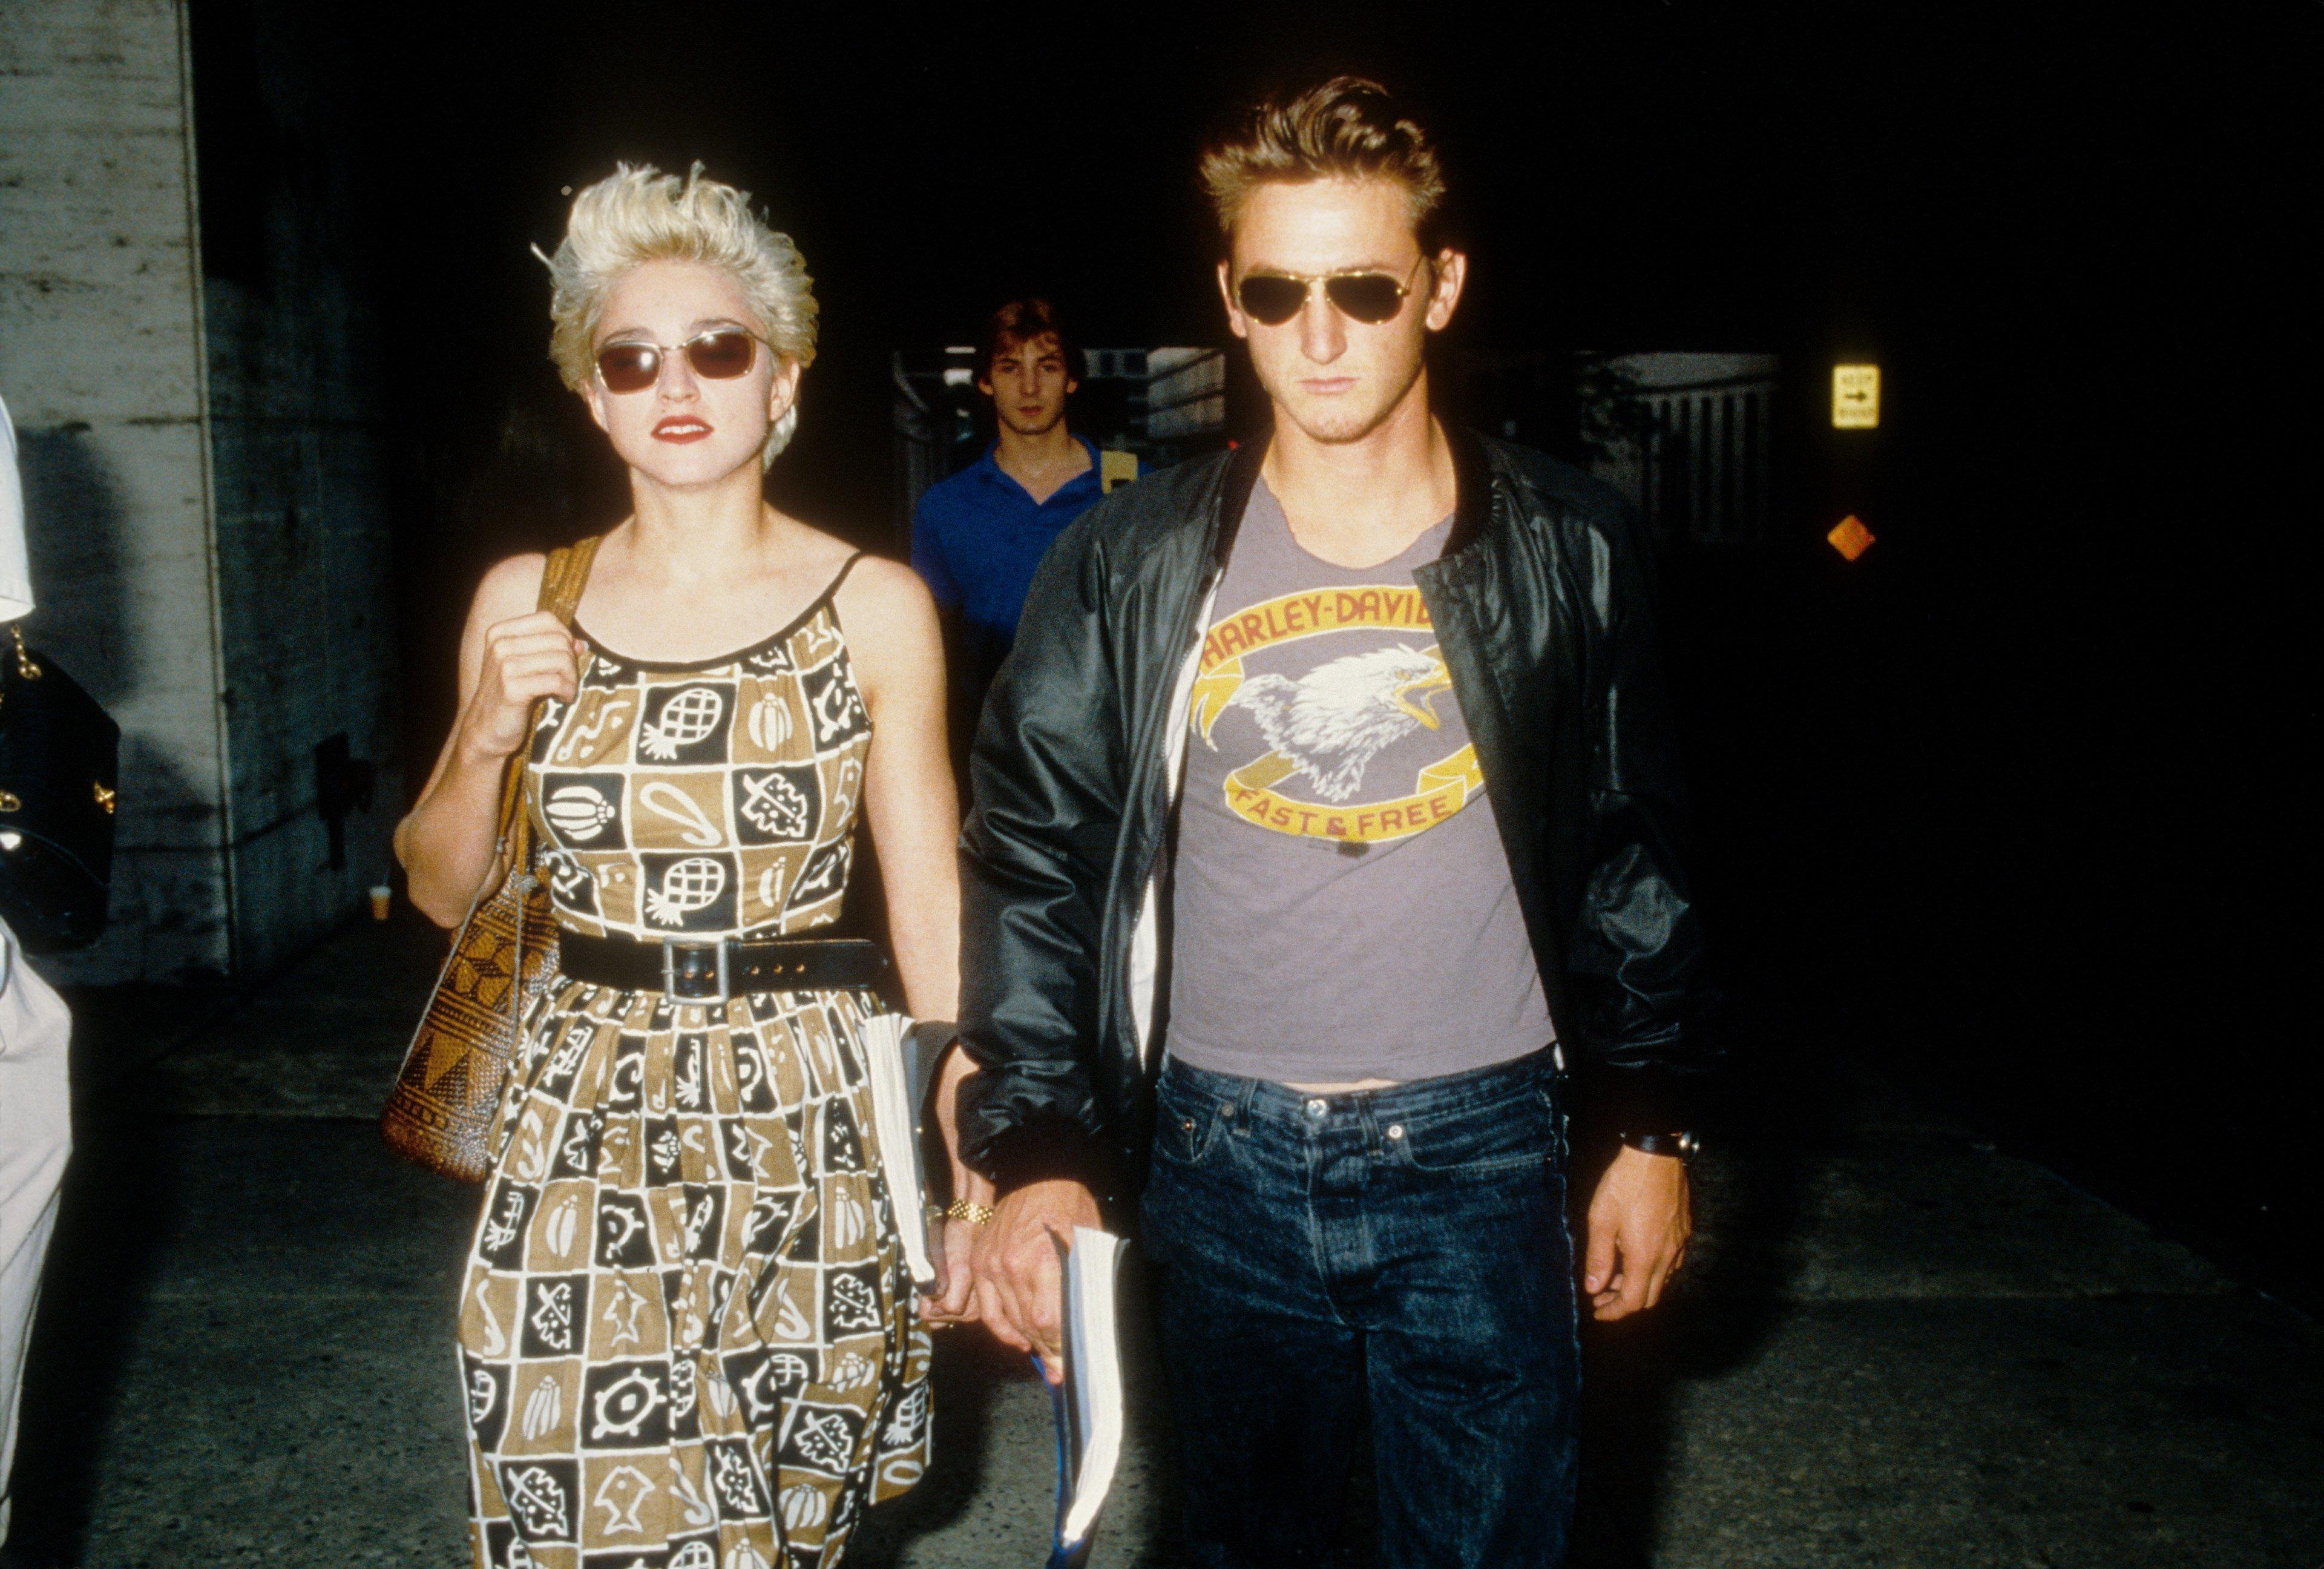 "Madonna<a href=""https://www.etonline.com/news/170048_madonna_posts_pda_pic_with_sean_penn_ahead_of_57th_birthday"" target=""_bl"